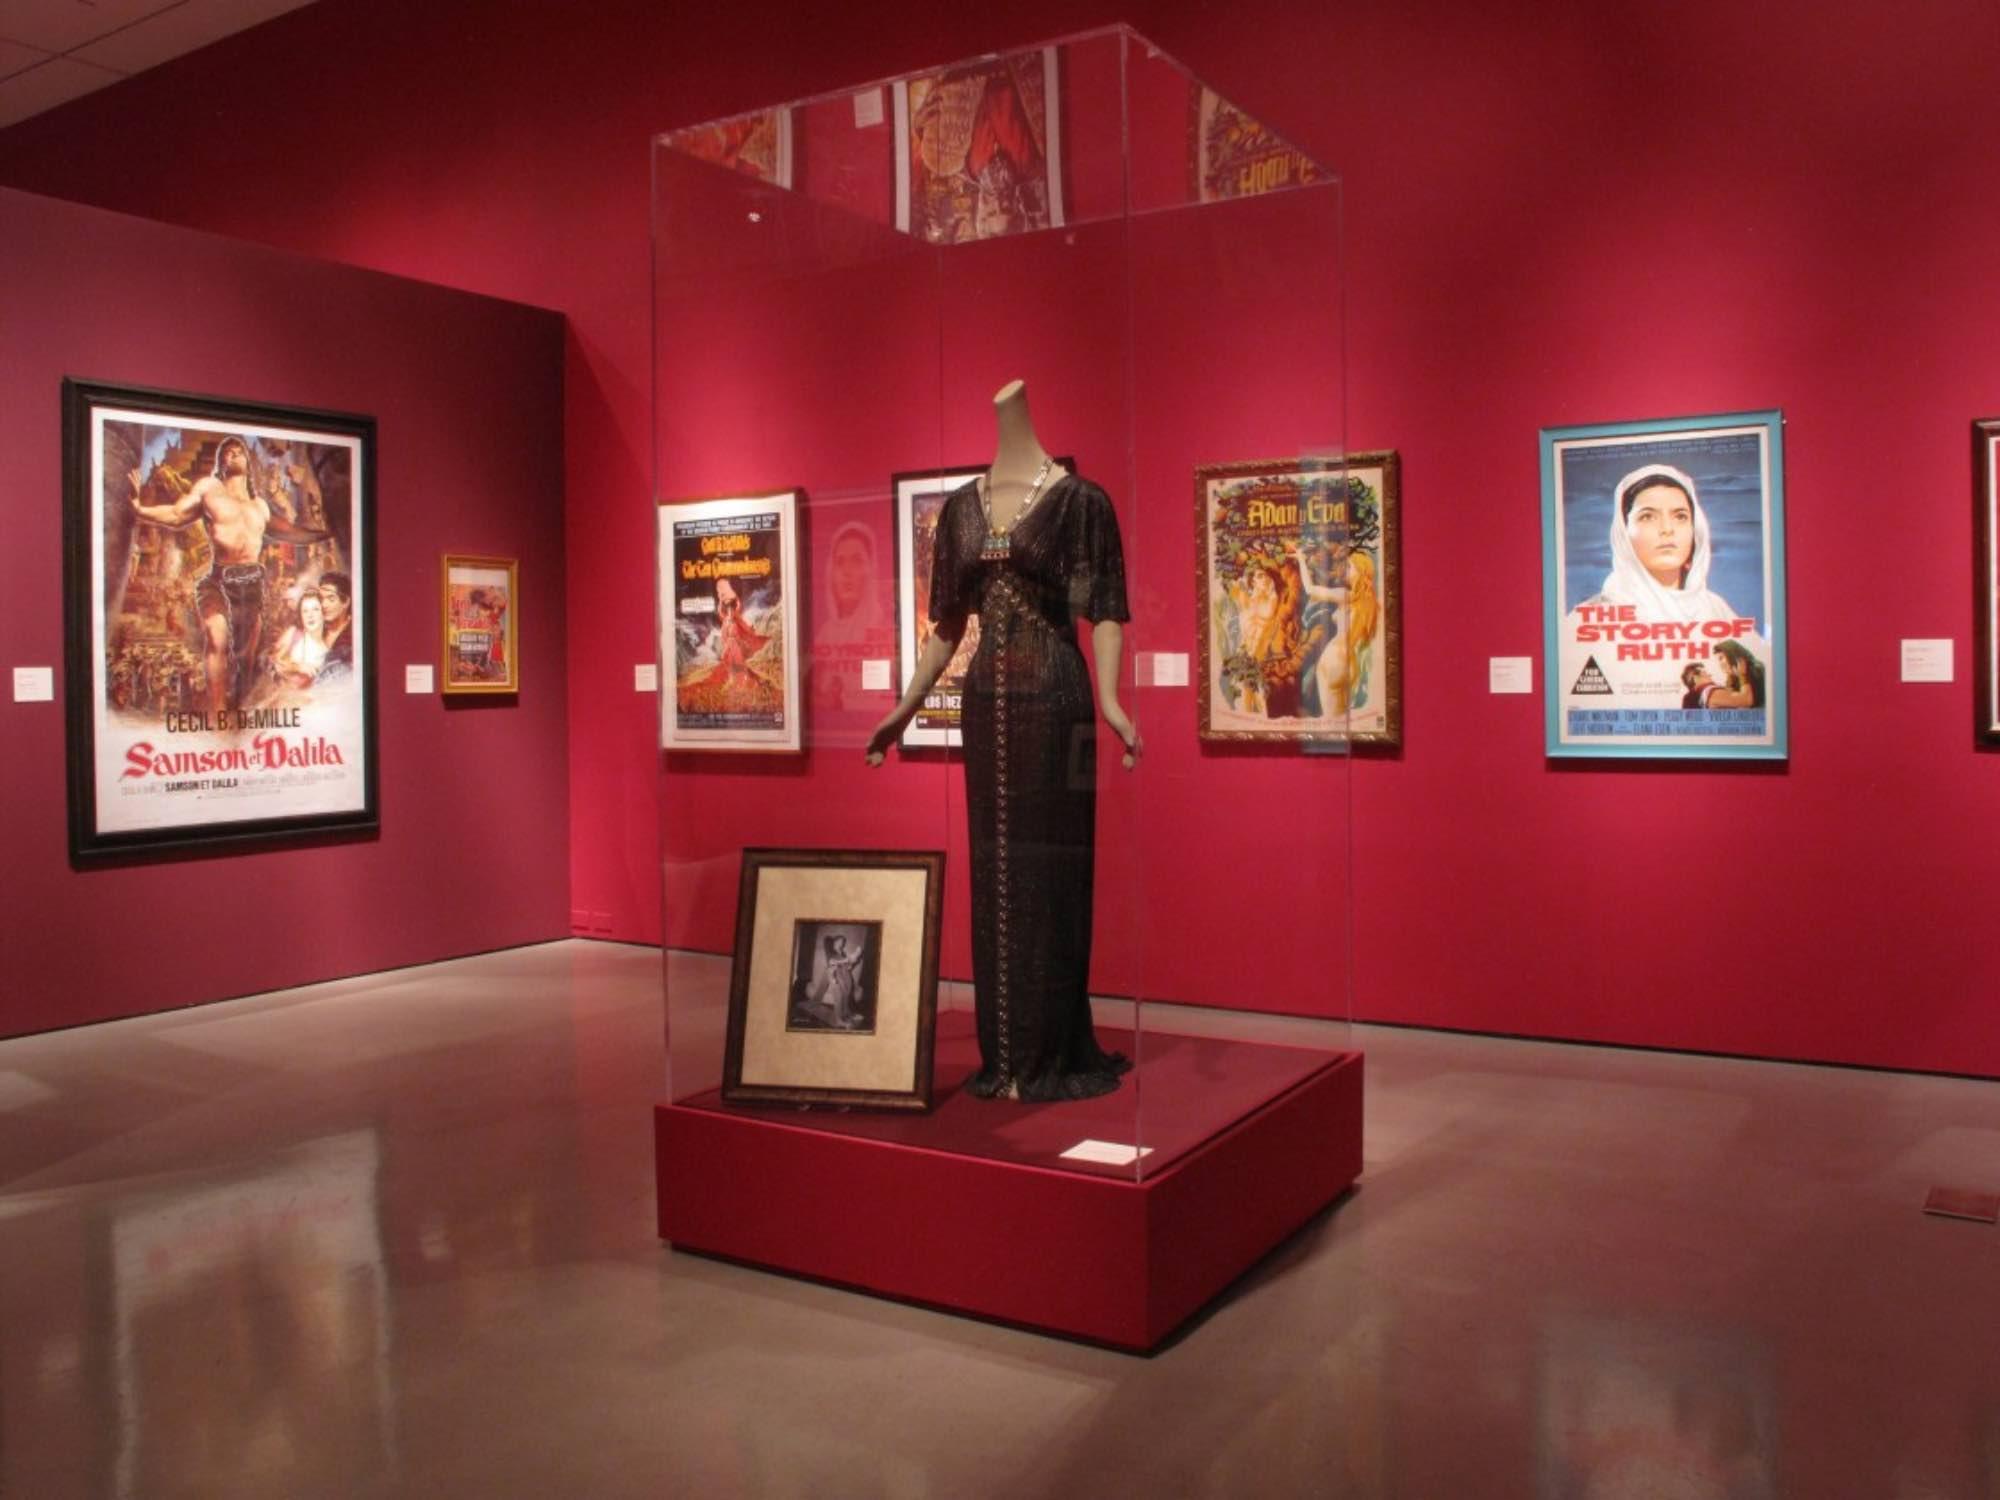 "Museum of Biblical Art- New York, New York February 6, 2009- May 17, 2009 Piece shown in photo: Nina Foch, ""The Ten Commandments,"" Paramount, 1956, Edith Head"